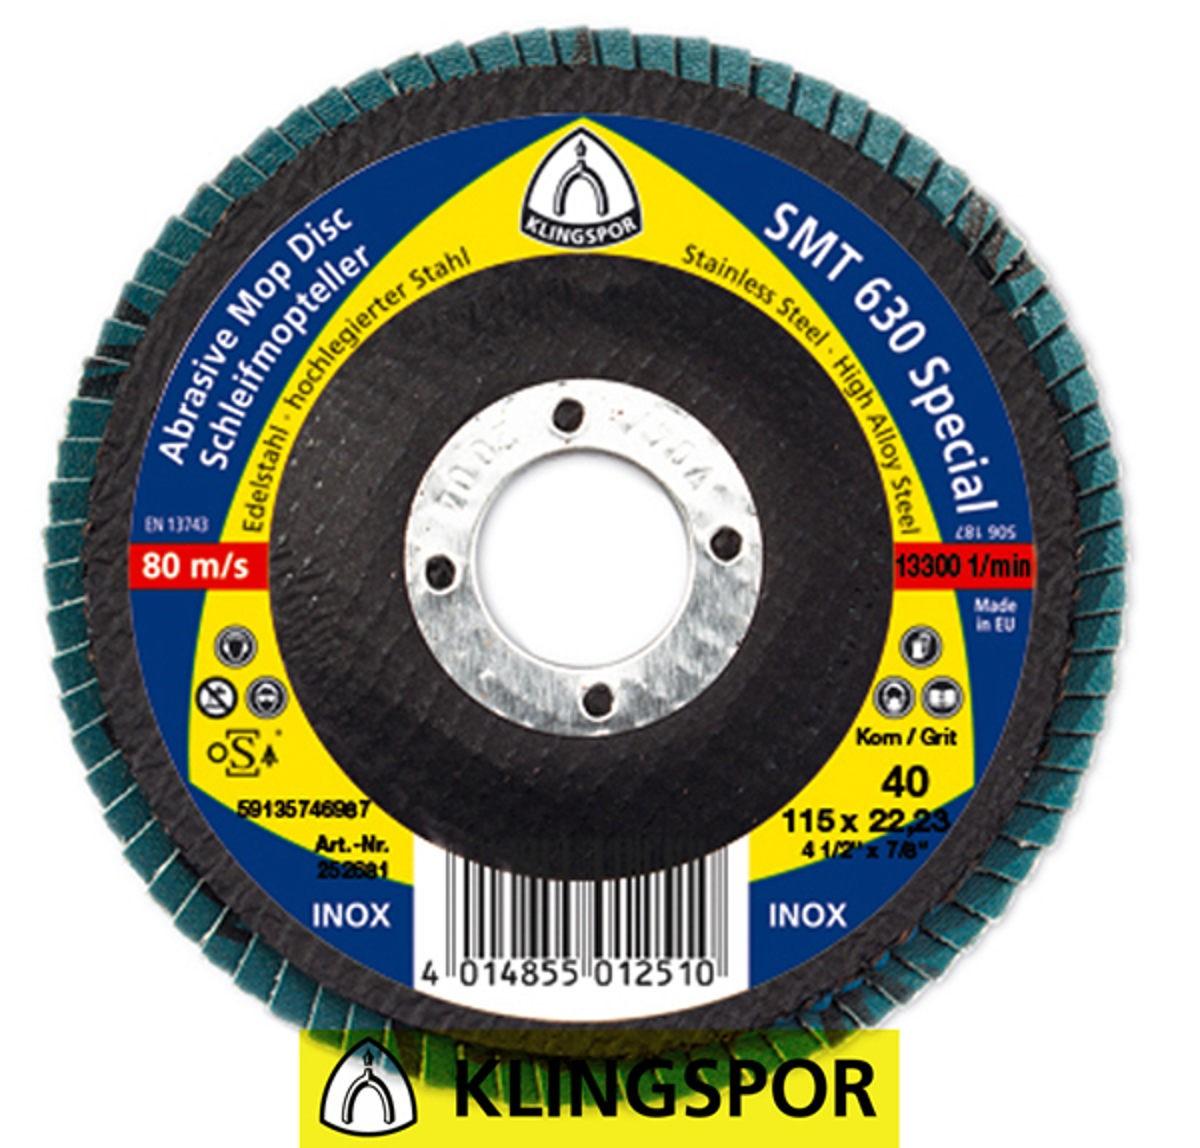 DISCO FLAP 115X22.23 G.80 SMT630 SPECIAL  KLINGSPOR SMT630